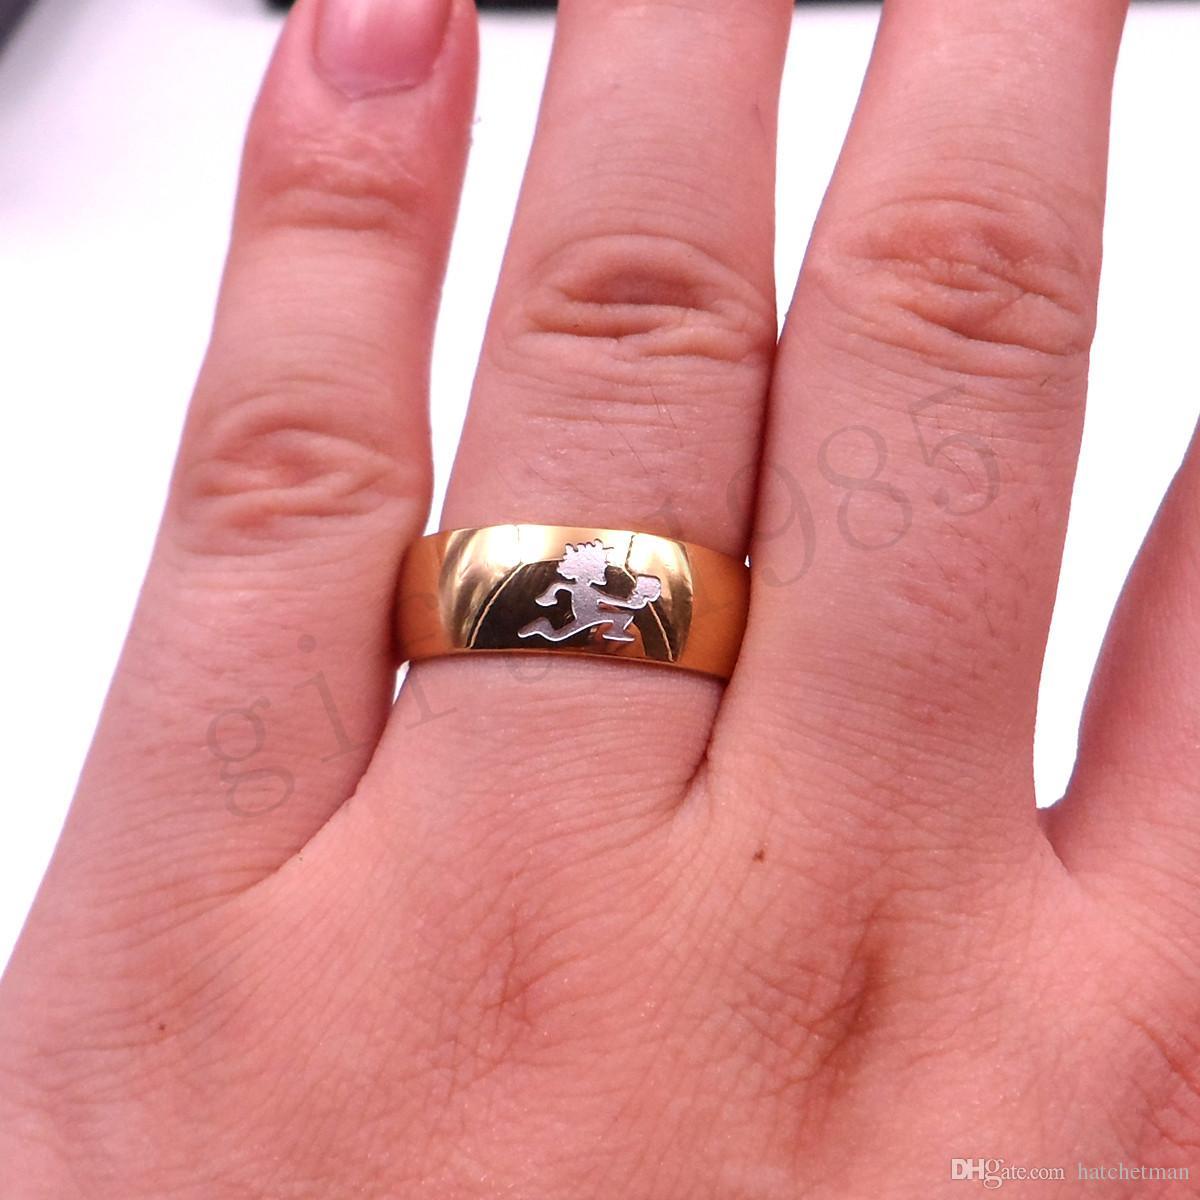 HATCHETMAN GIRL GOLDEN RING STAINLESS STEEL ICP Gravura TWIZTID ALTAMENTE POLIDO High quality polido, banhado a ouro anel